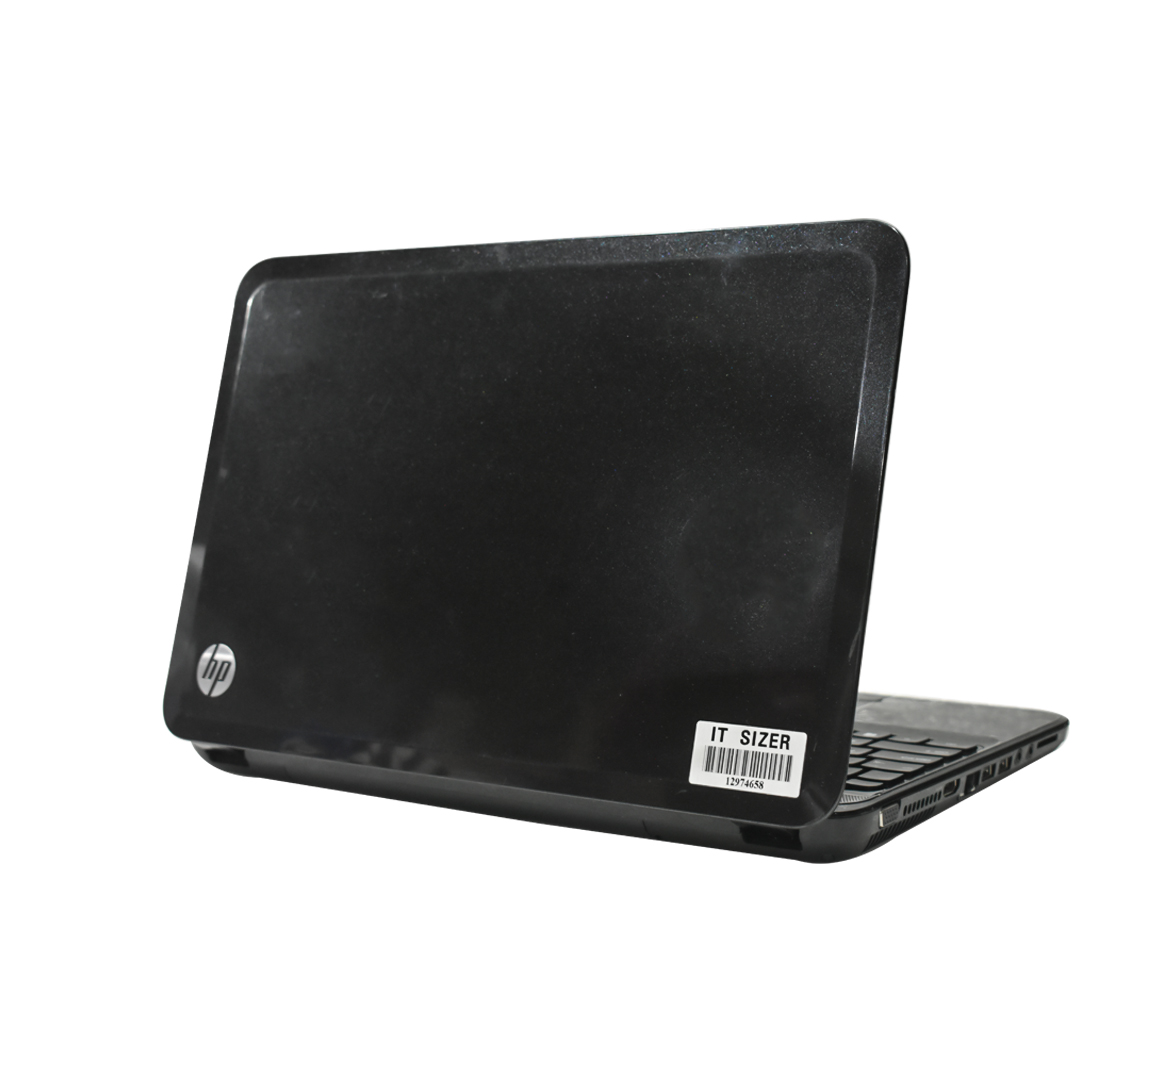 HP Pavilion G6 Business Laptop, AMD A6 CPU, 4GB DDR3L SODIMM RAM, 320GB SATA 2.5 Hard, 15 inch Display (Refurbished)